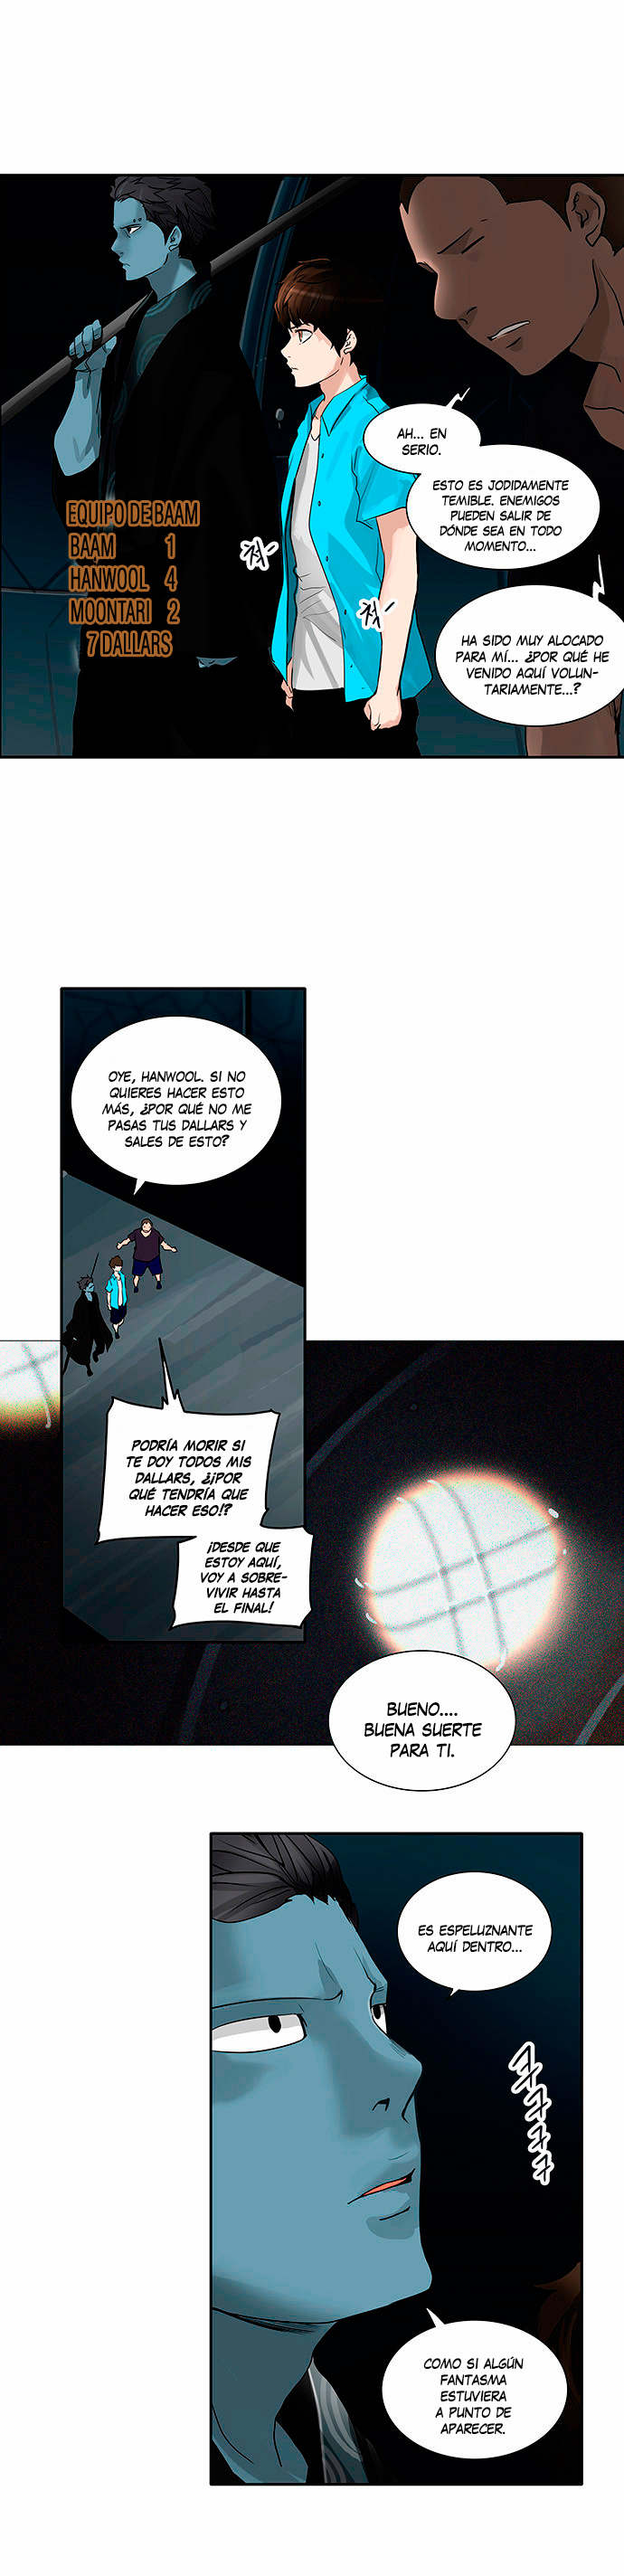 http://c5.ninemanga.com/es_manga/21/149/424362/ade63a14619c1f6136bccb1de2debe55.jpg Page 3